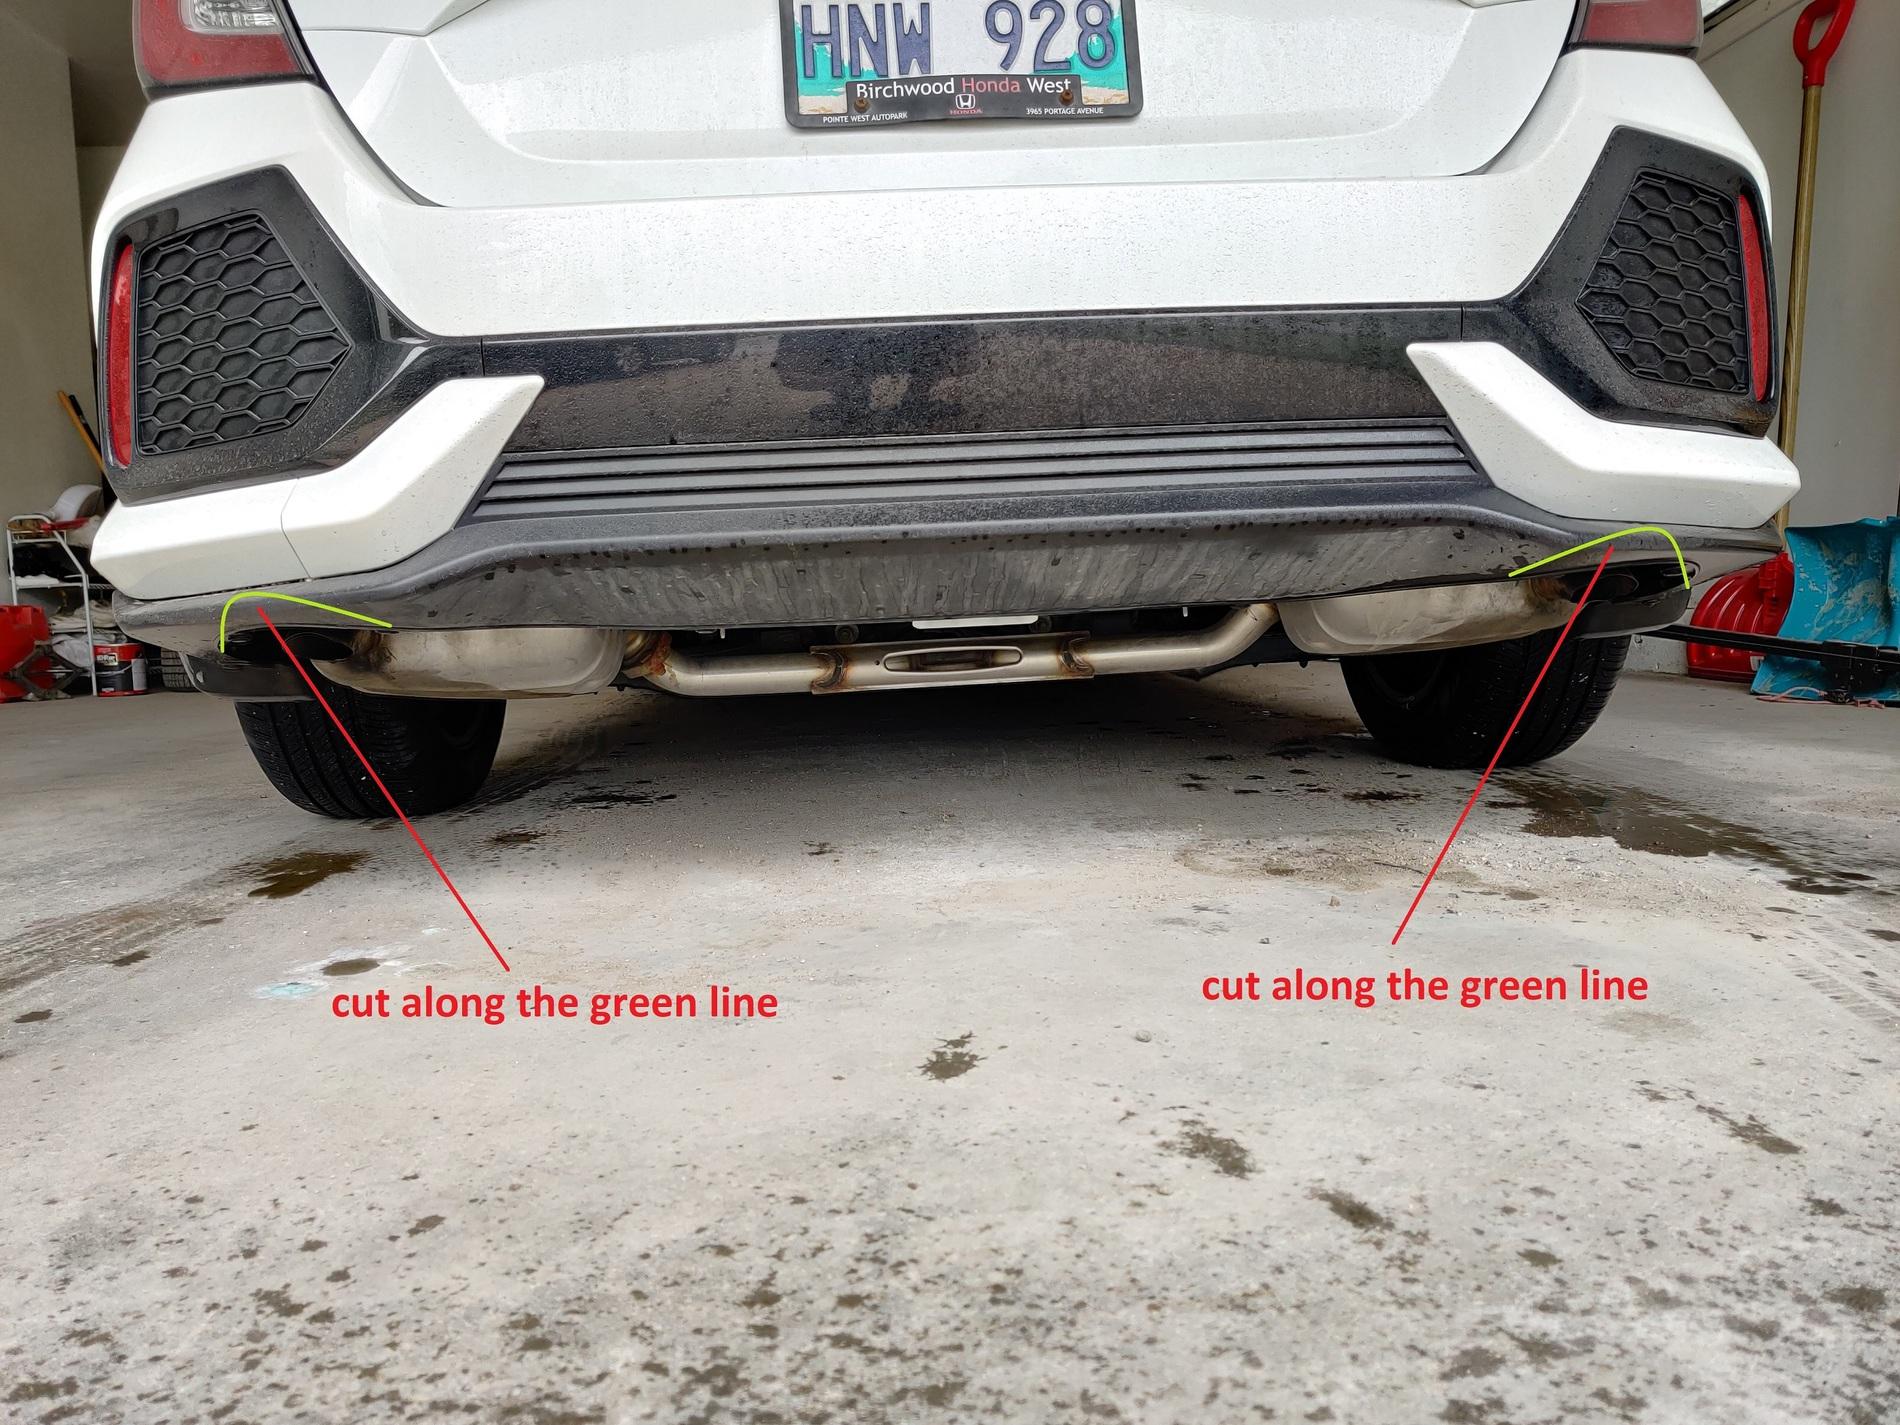 hatchback non sport rear bumper cut or